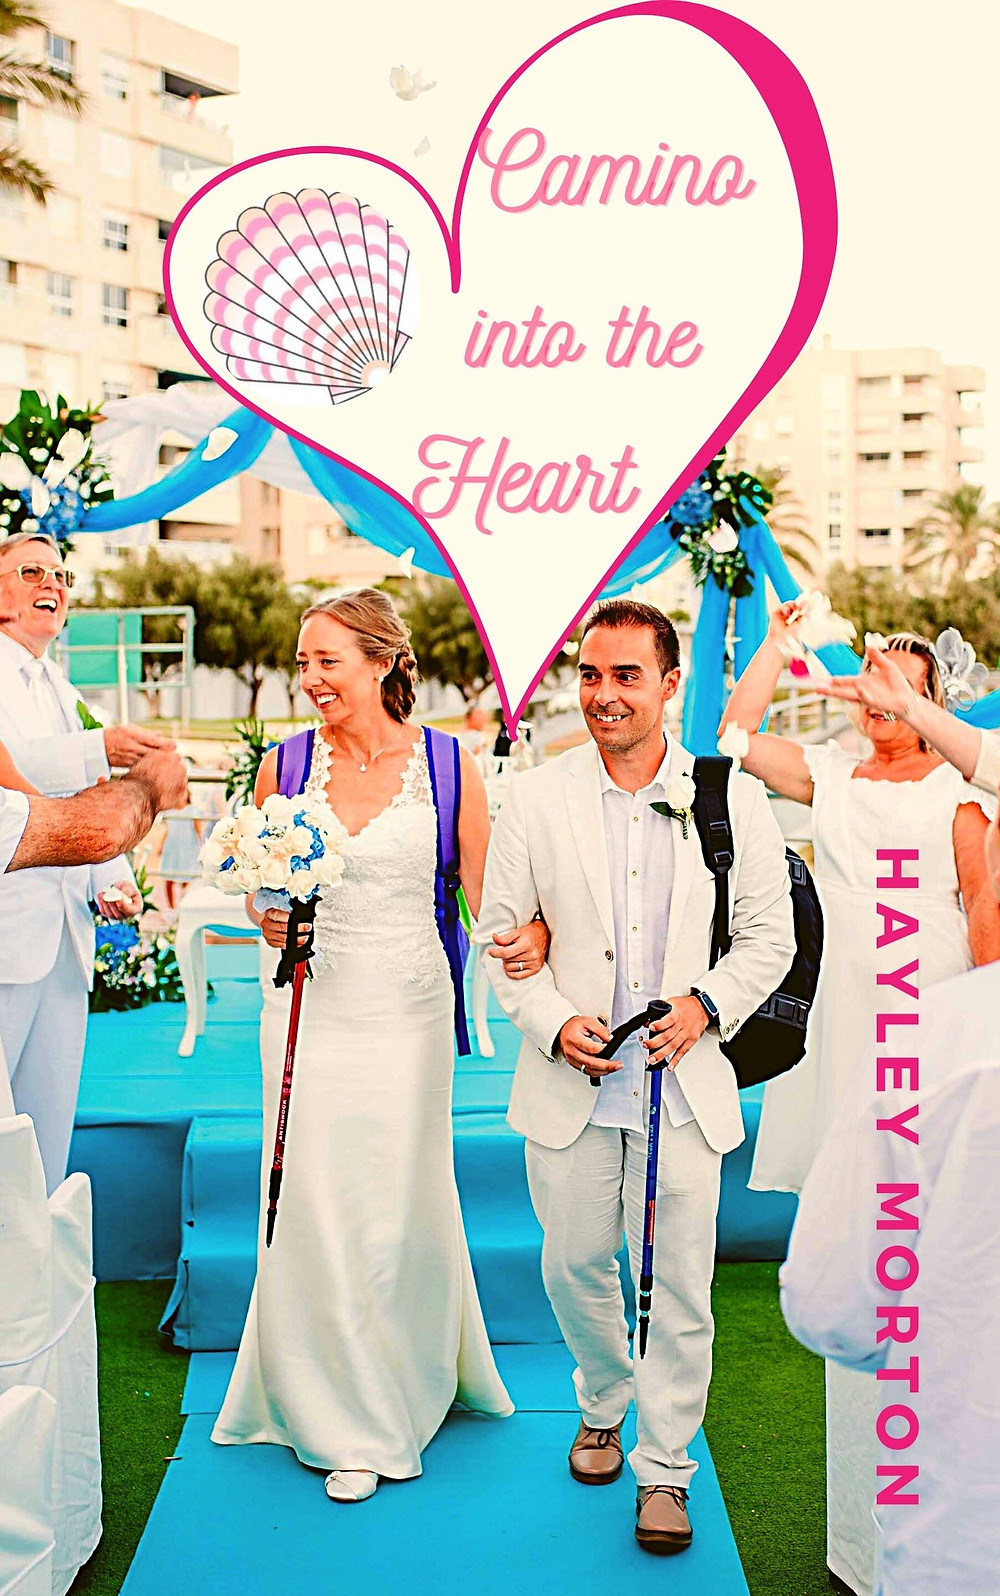 Camino de Santiago themed wedding photo and story